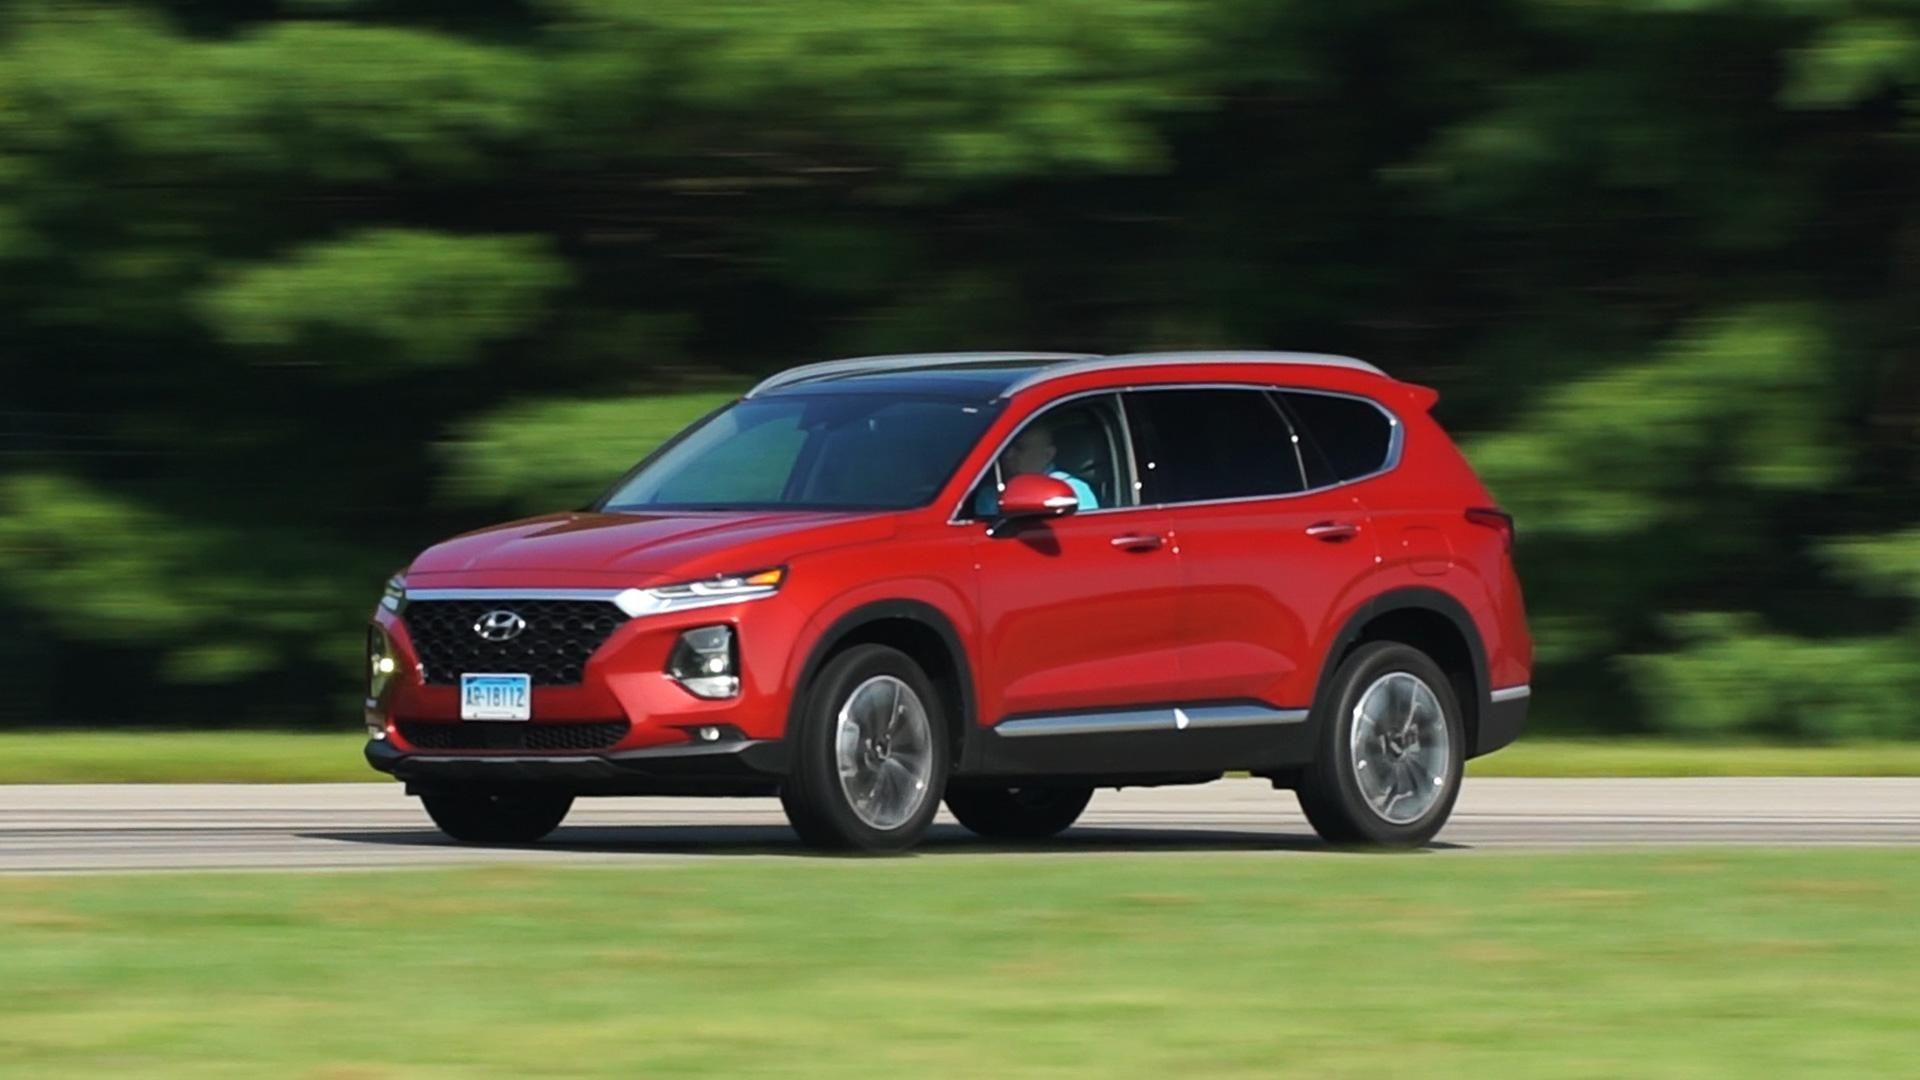 2019 Hyundai Santa Fe Is A Well Rounded Impressive Suv Hyundai Santa Fe Hyundai New Cars